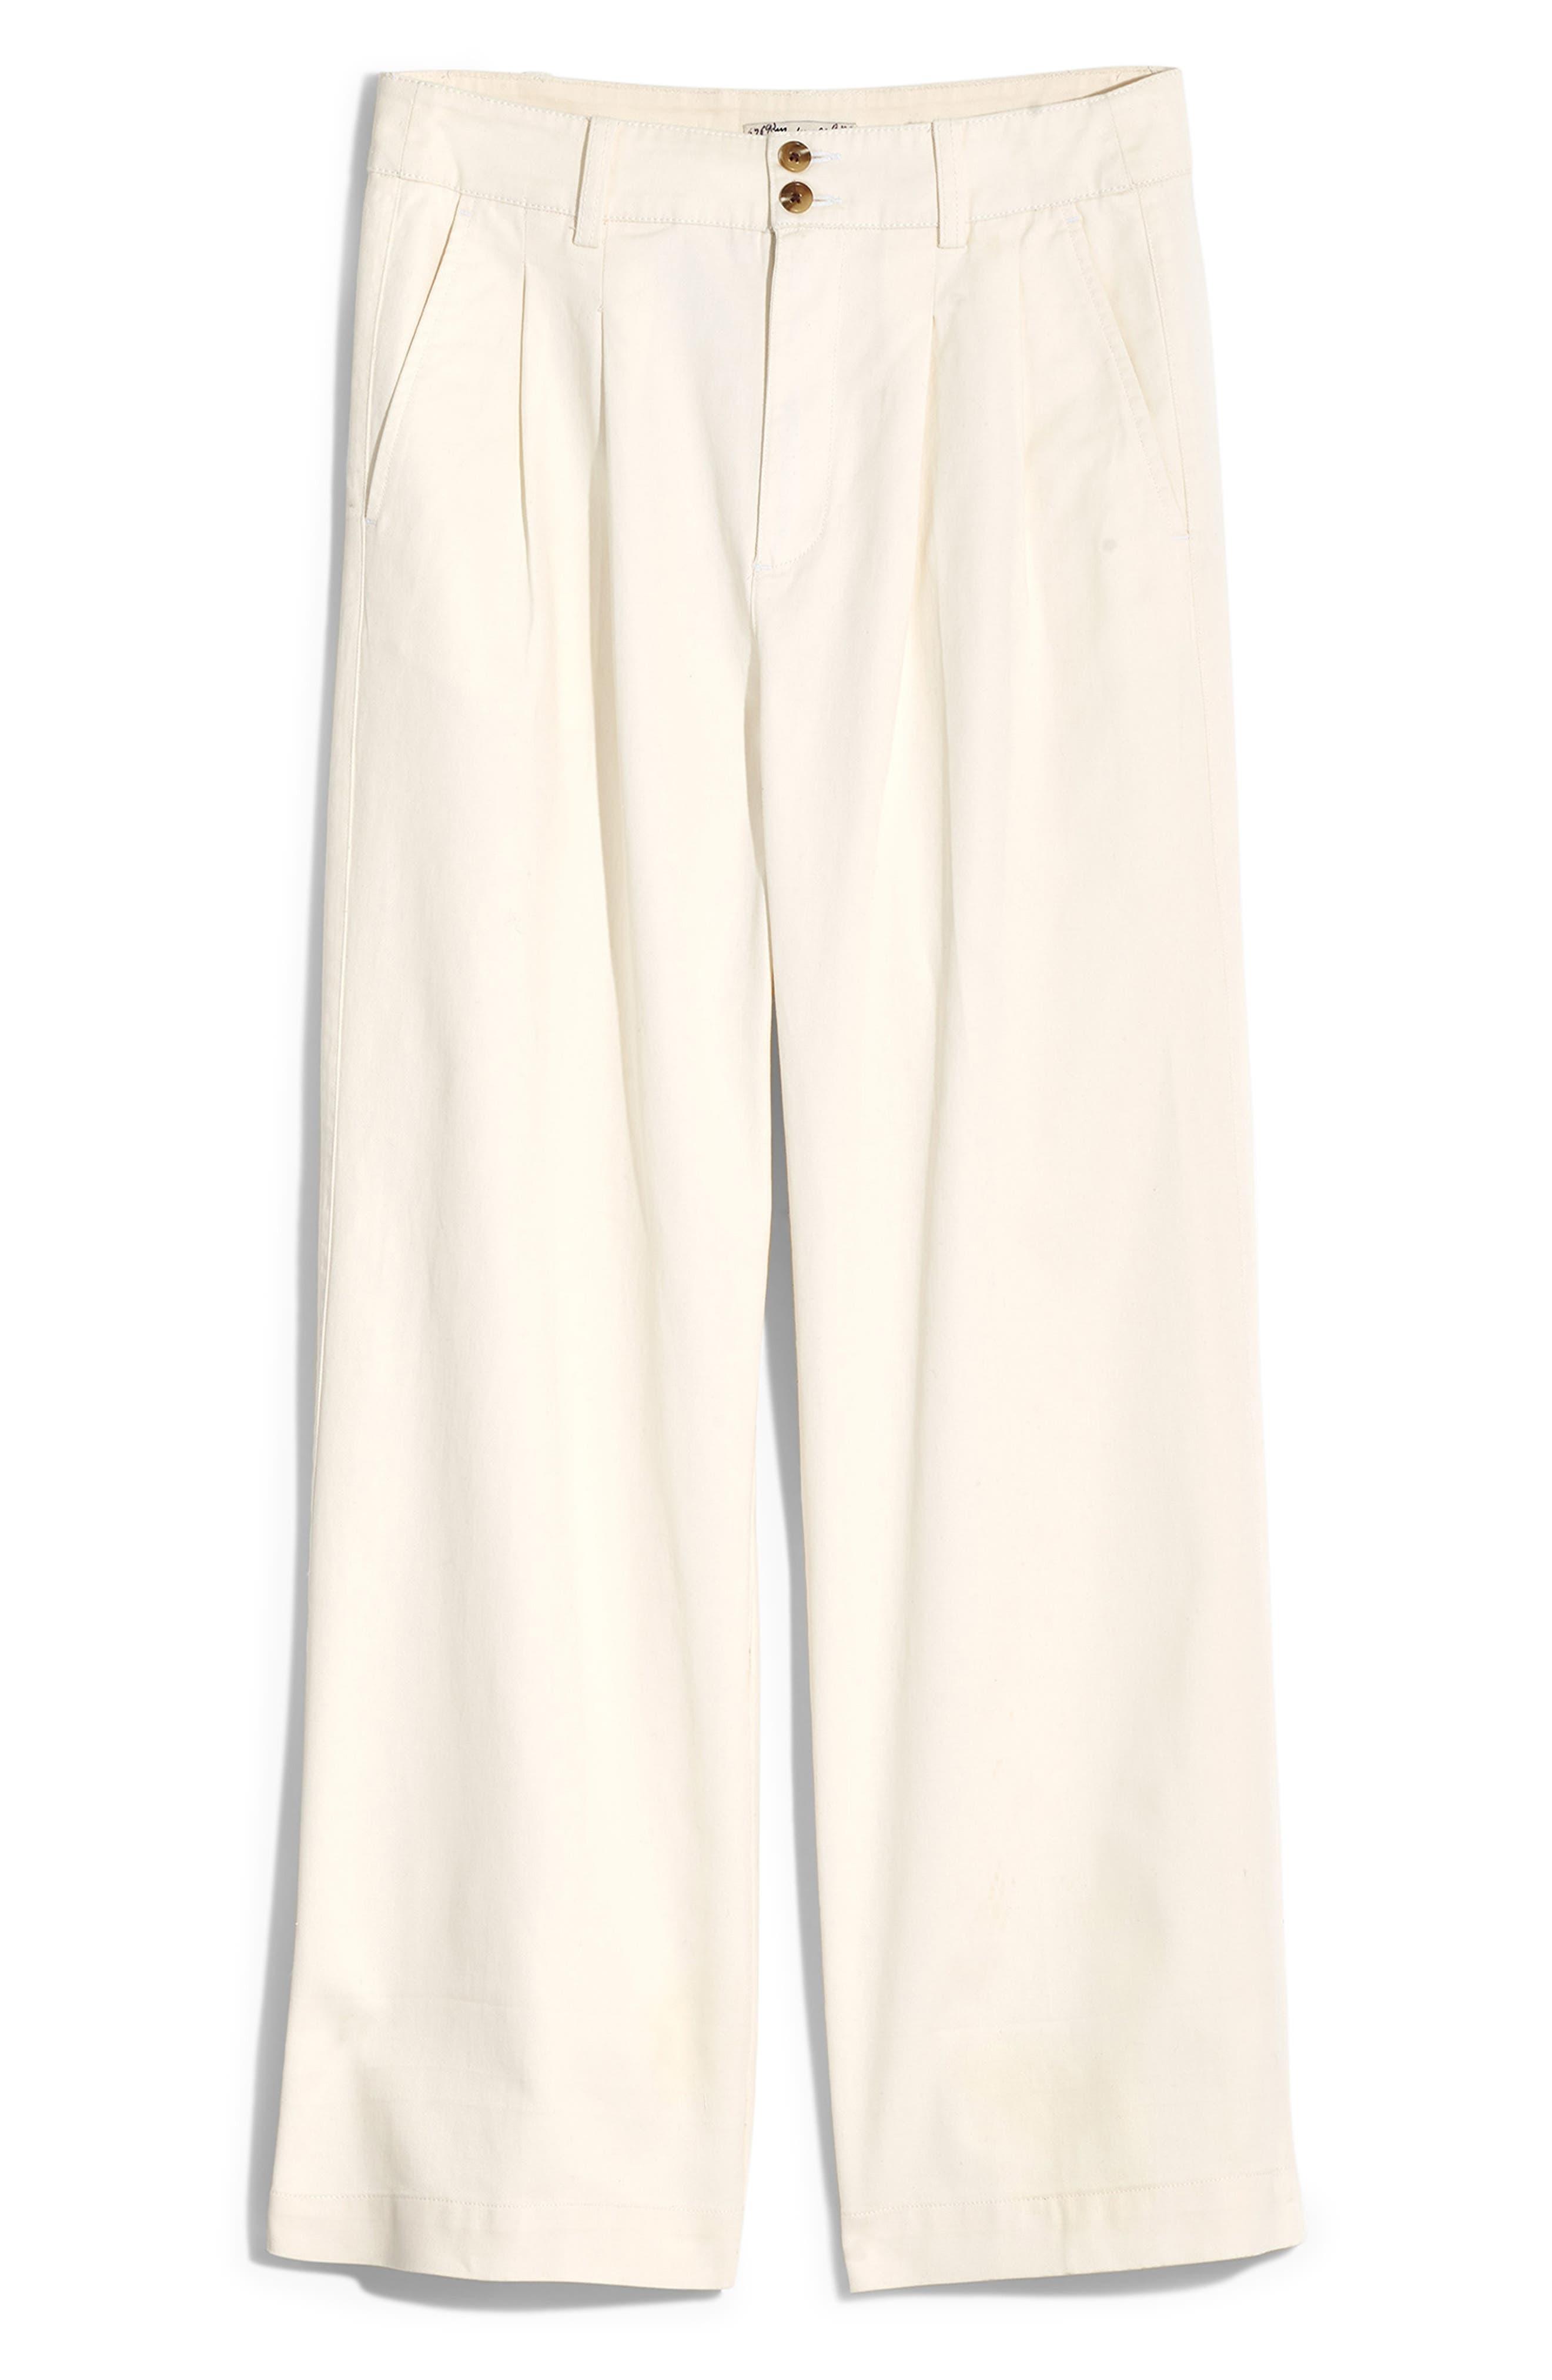 MADEWELL, High Waist Crop Wide Leg Pants, Alternate thumbnail 6, color, LIGHTHOUSE